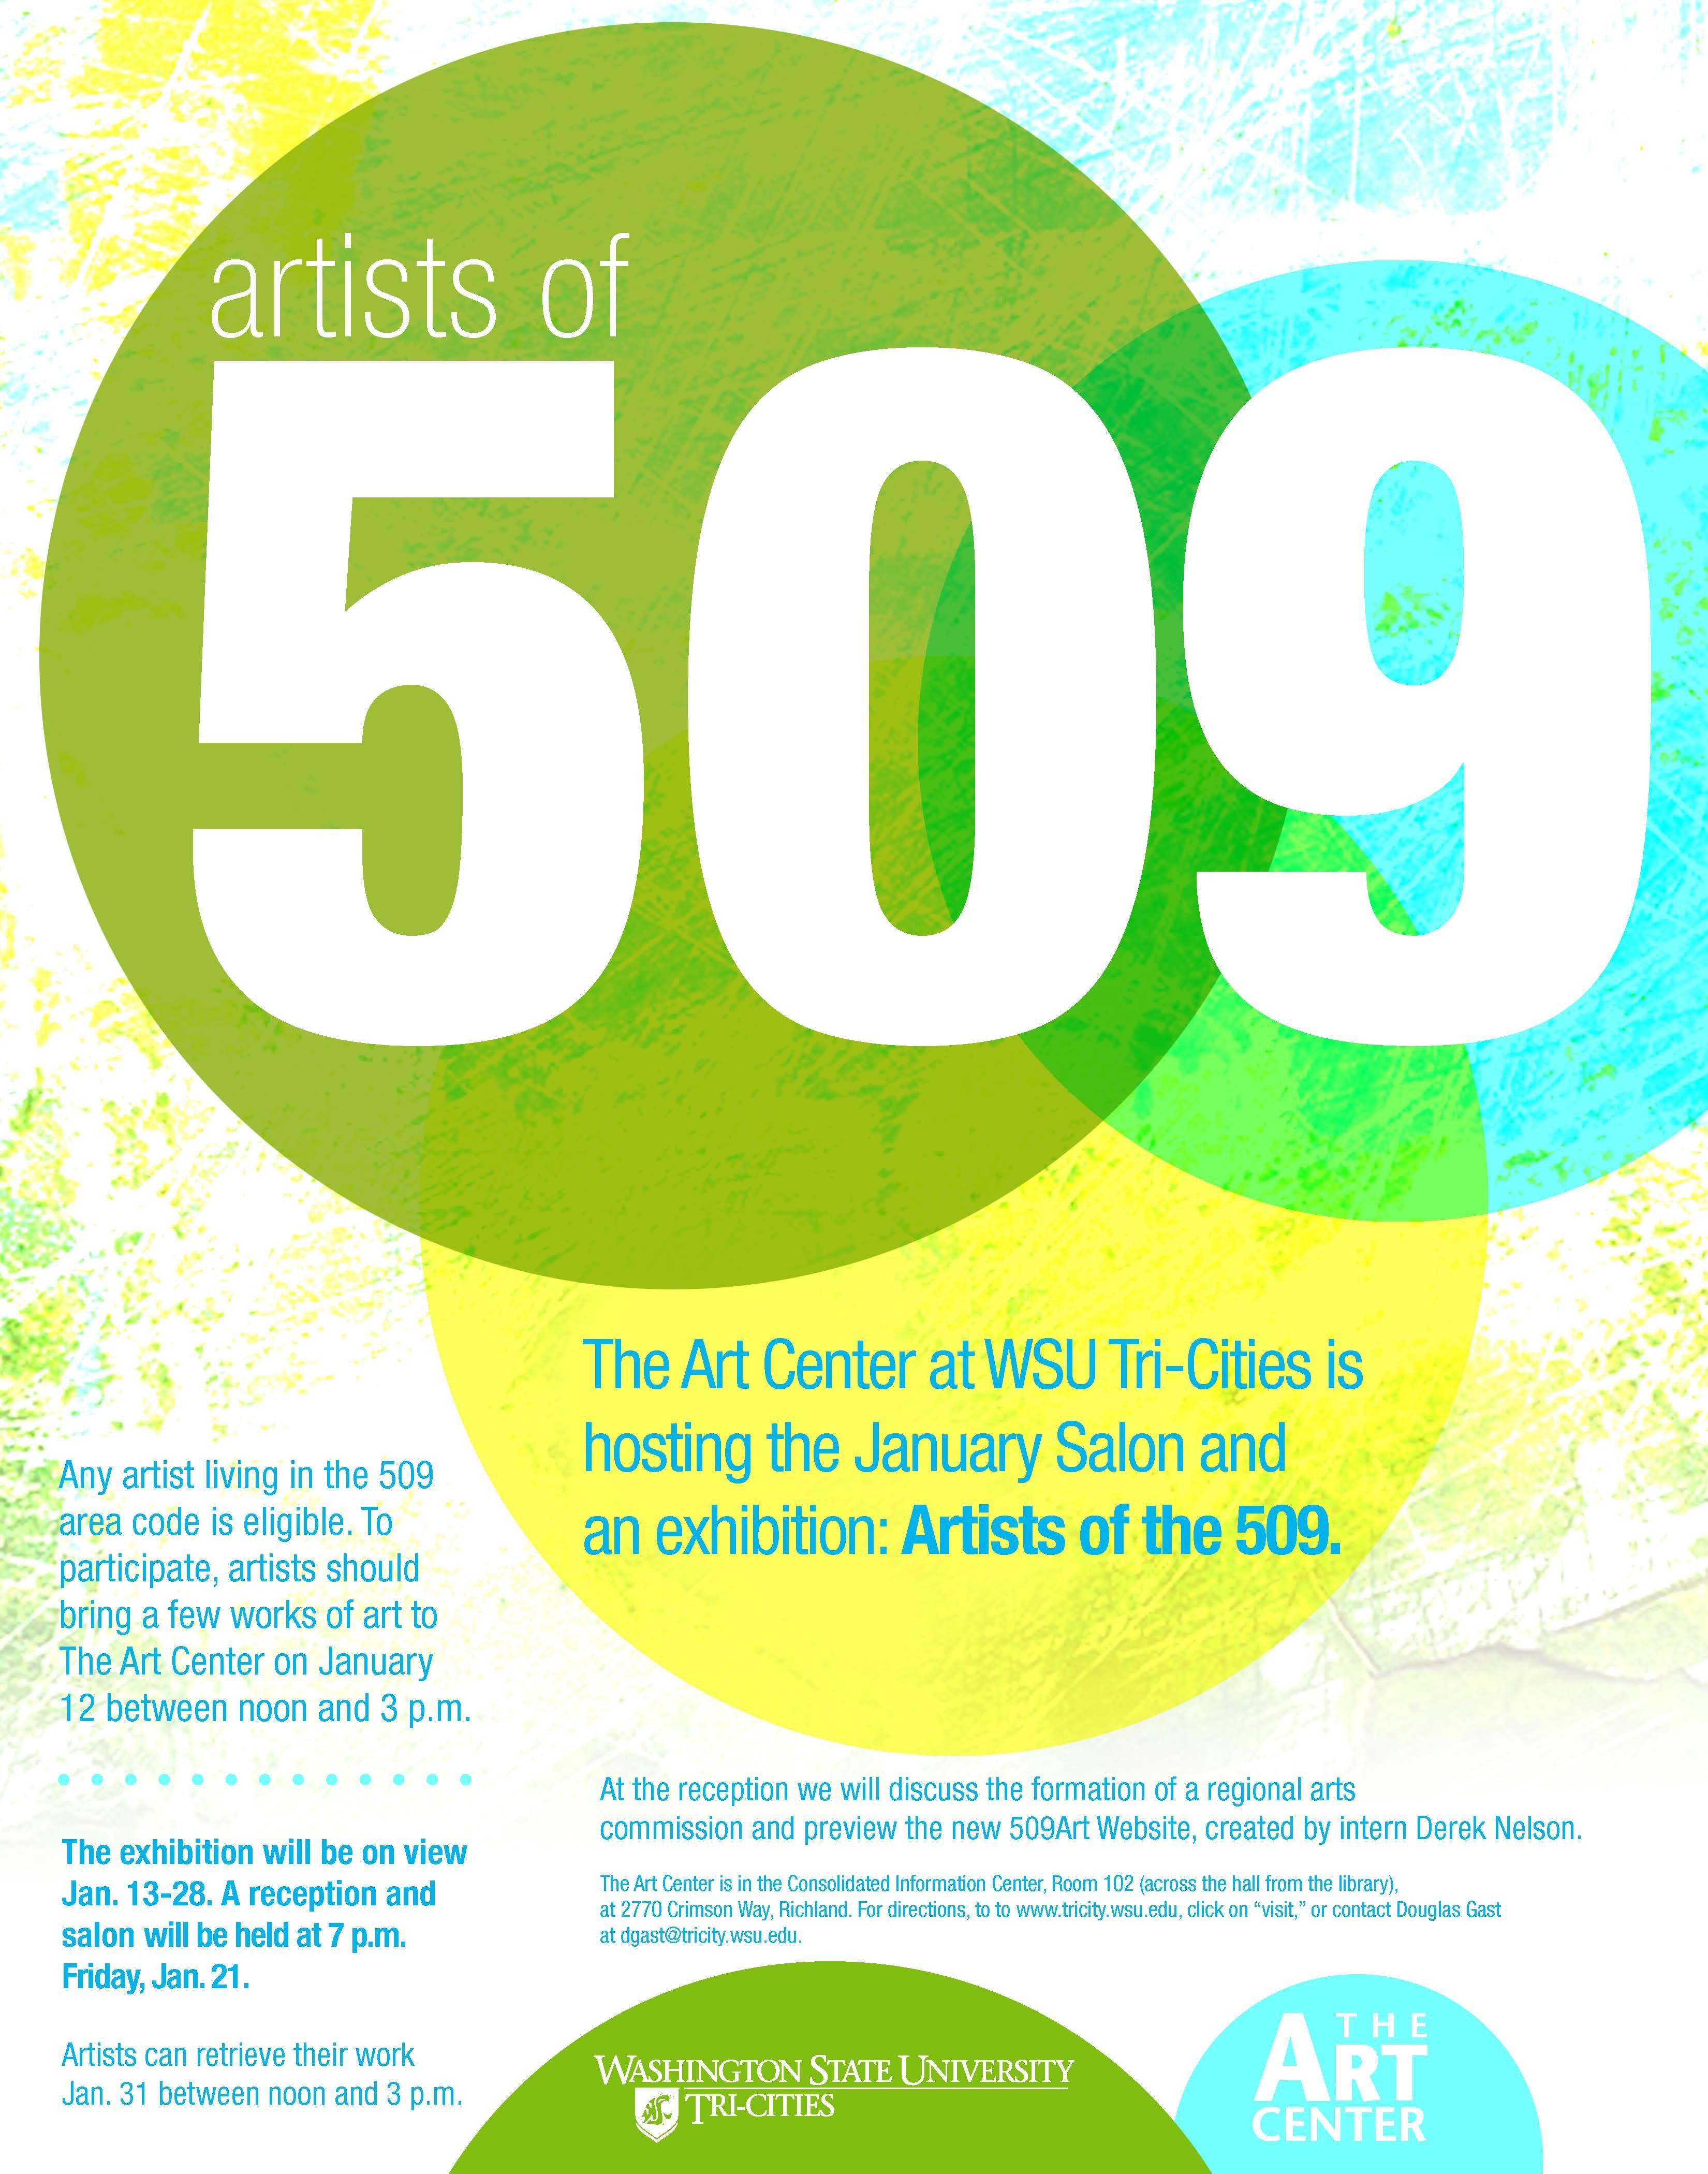 WSU TriCities Previous Exhibits - 509 area code